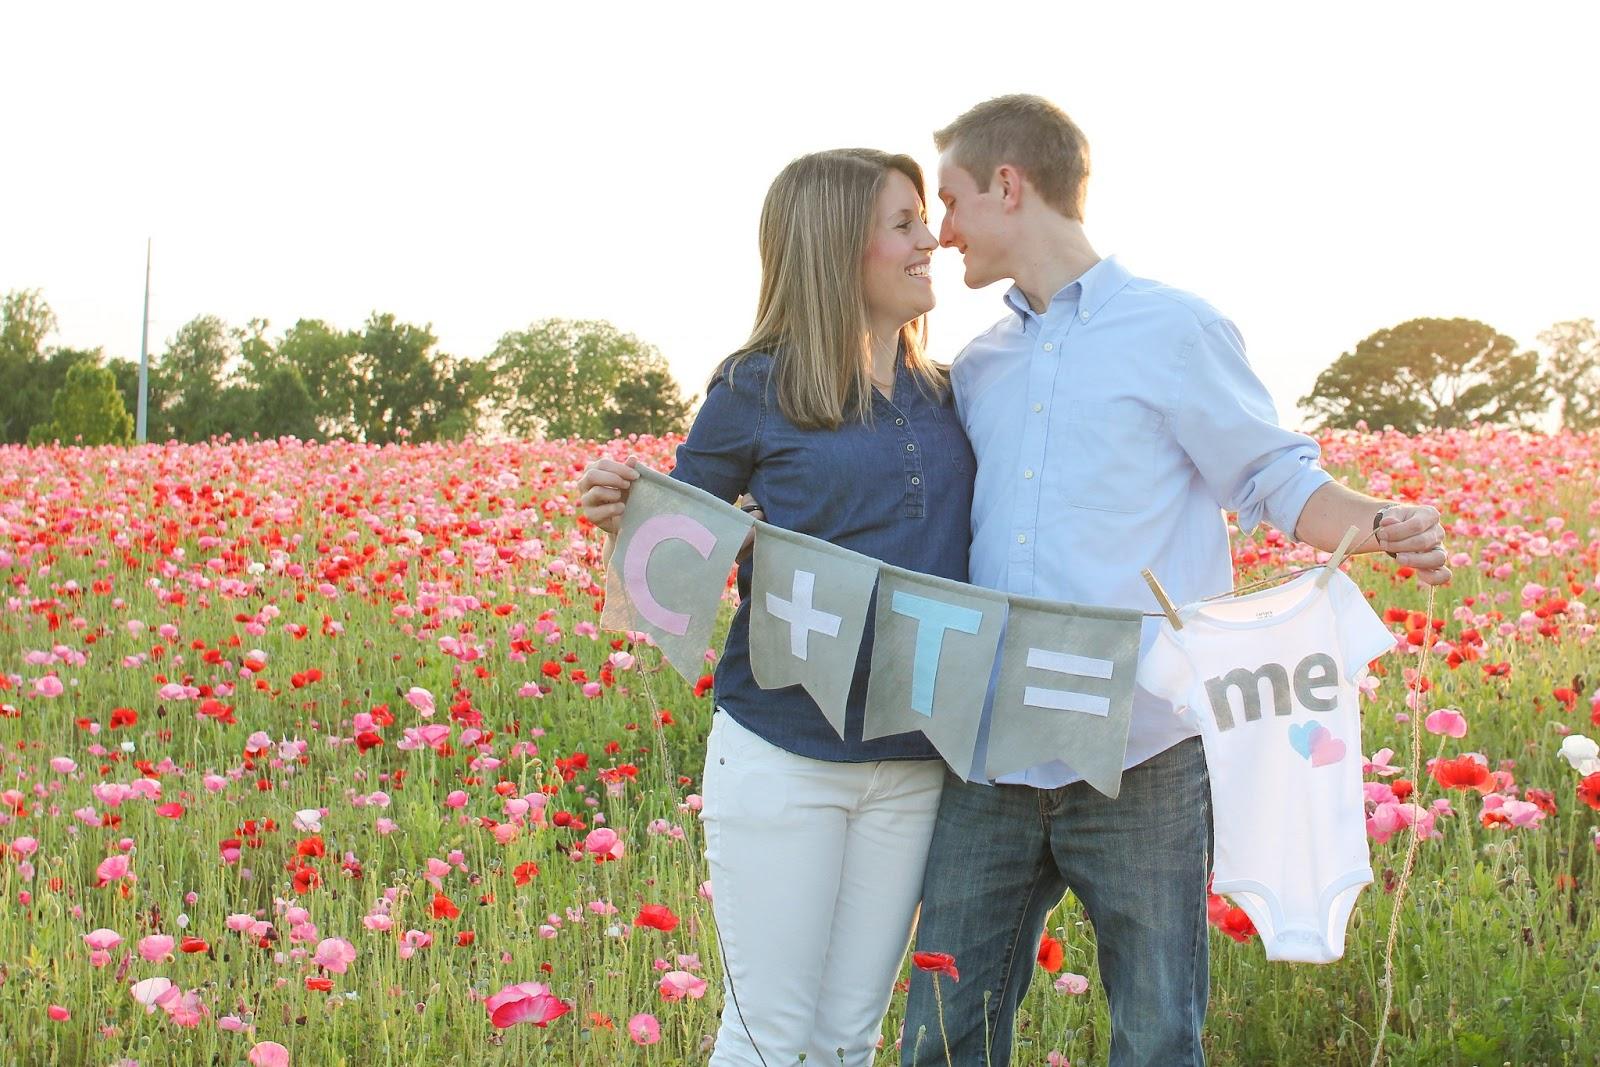 Savor His Goodness Pregnancy Announcement Baby Z is on the Way – Baby on the Way Announcement